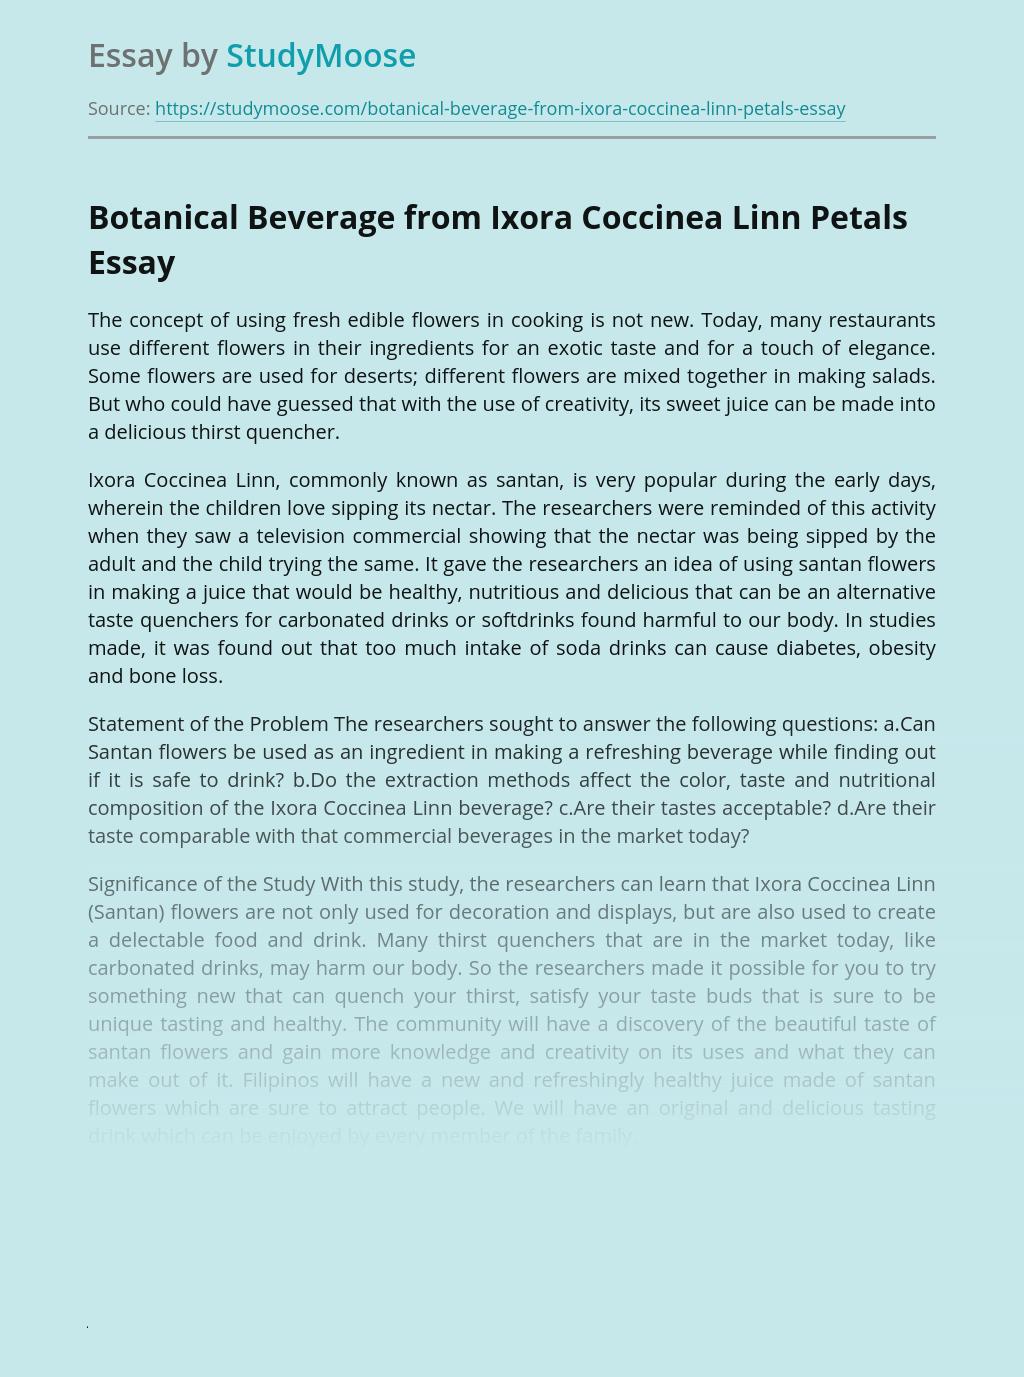 Preparation Ixora Coccinea Linn Flowers for Beverage